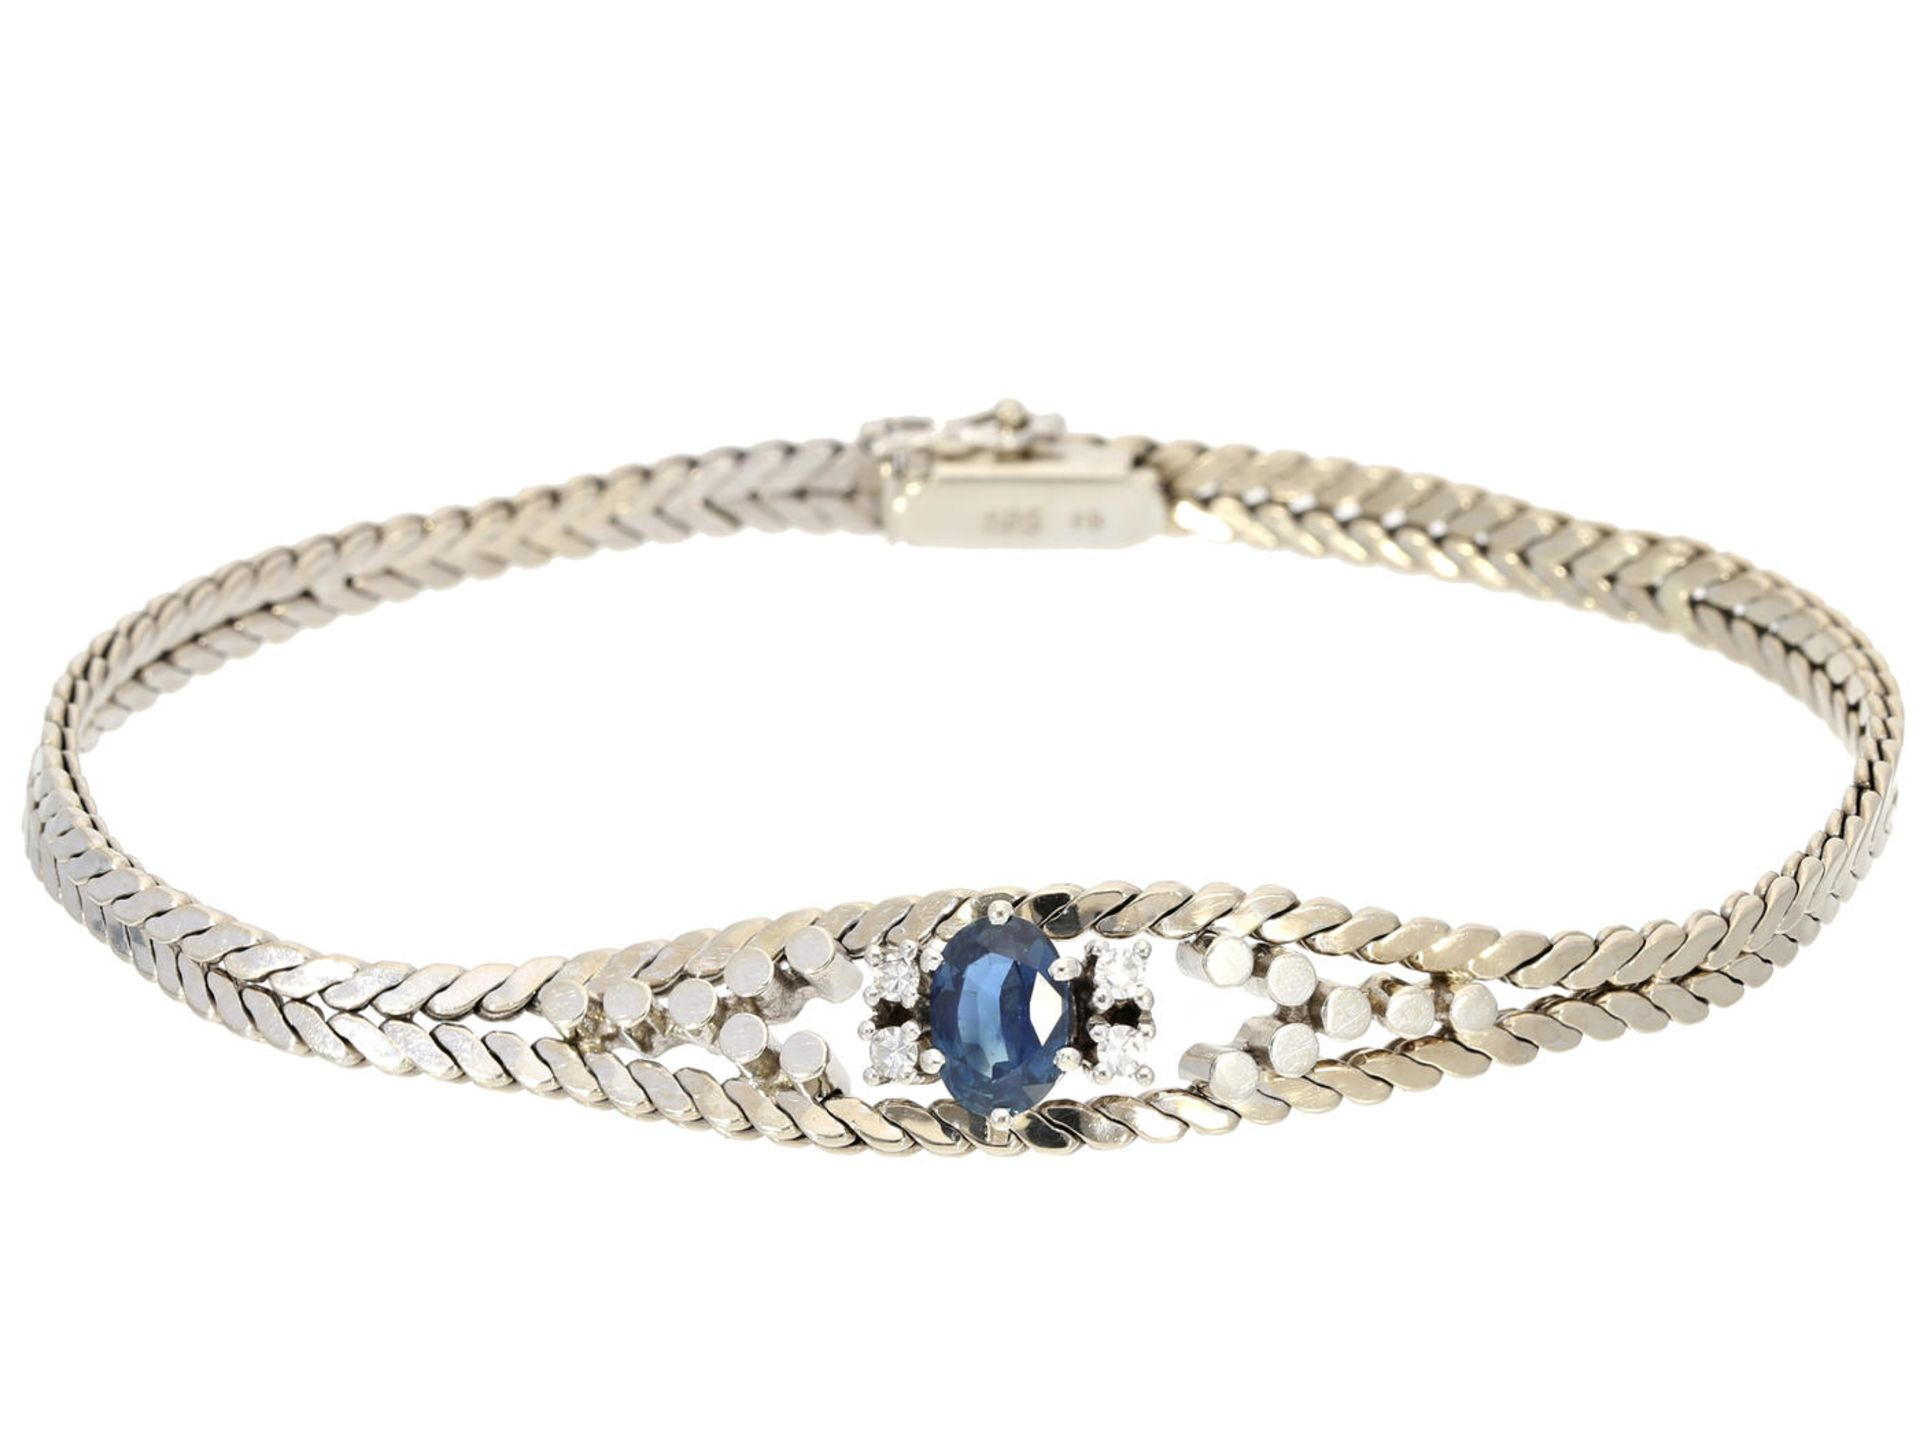 Los 6021 - Armband: sehr schönes vintage Saphir/Diamantarmband, Handarbeit um 1960 Ca. 19cm lang, ca. 16g,